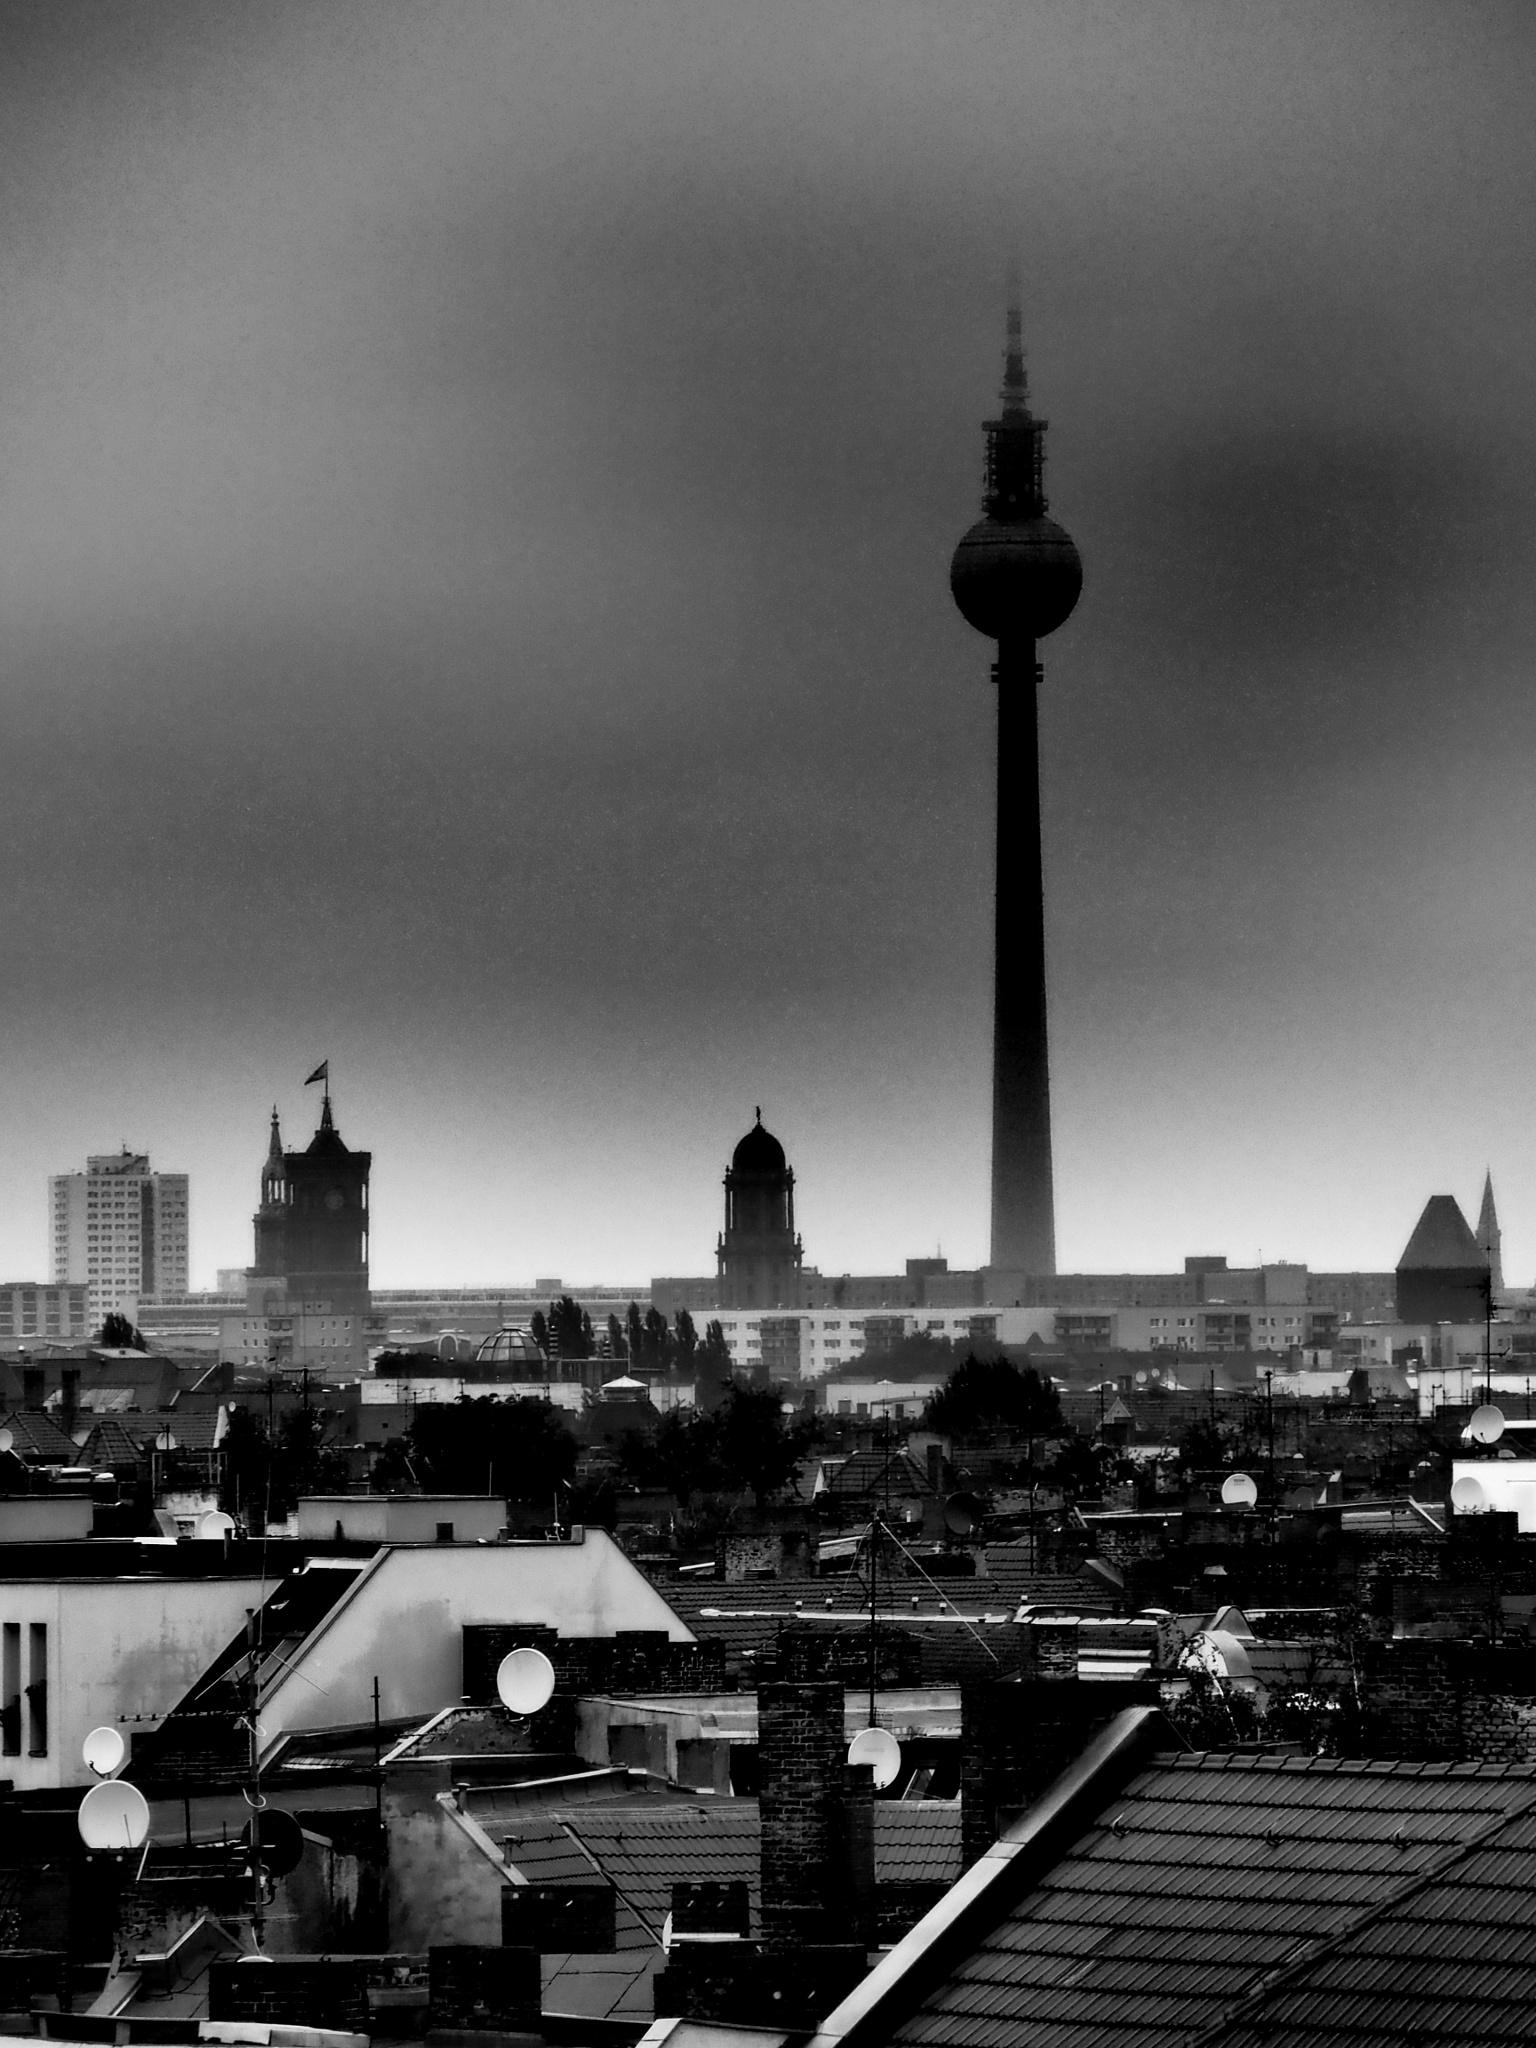 Berlin Black & White  by Jeans Brown Photography / Jens Schwarz